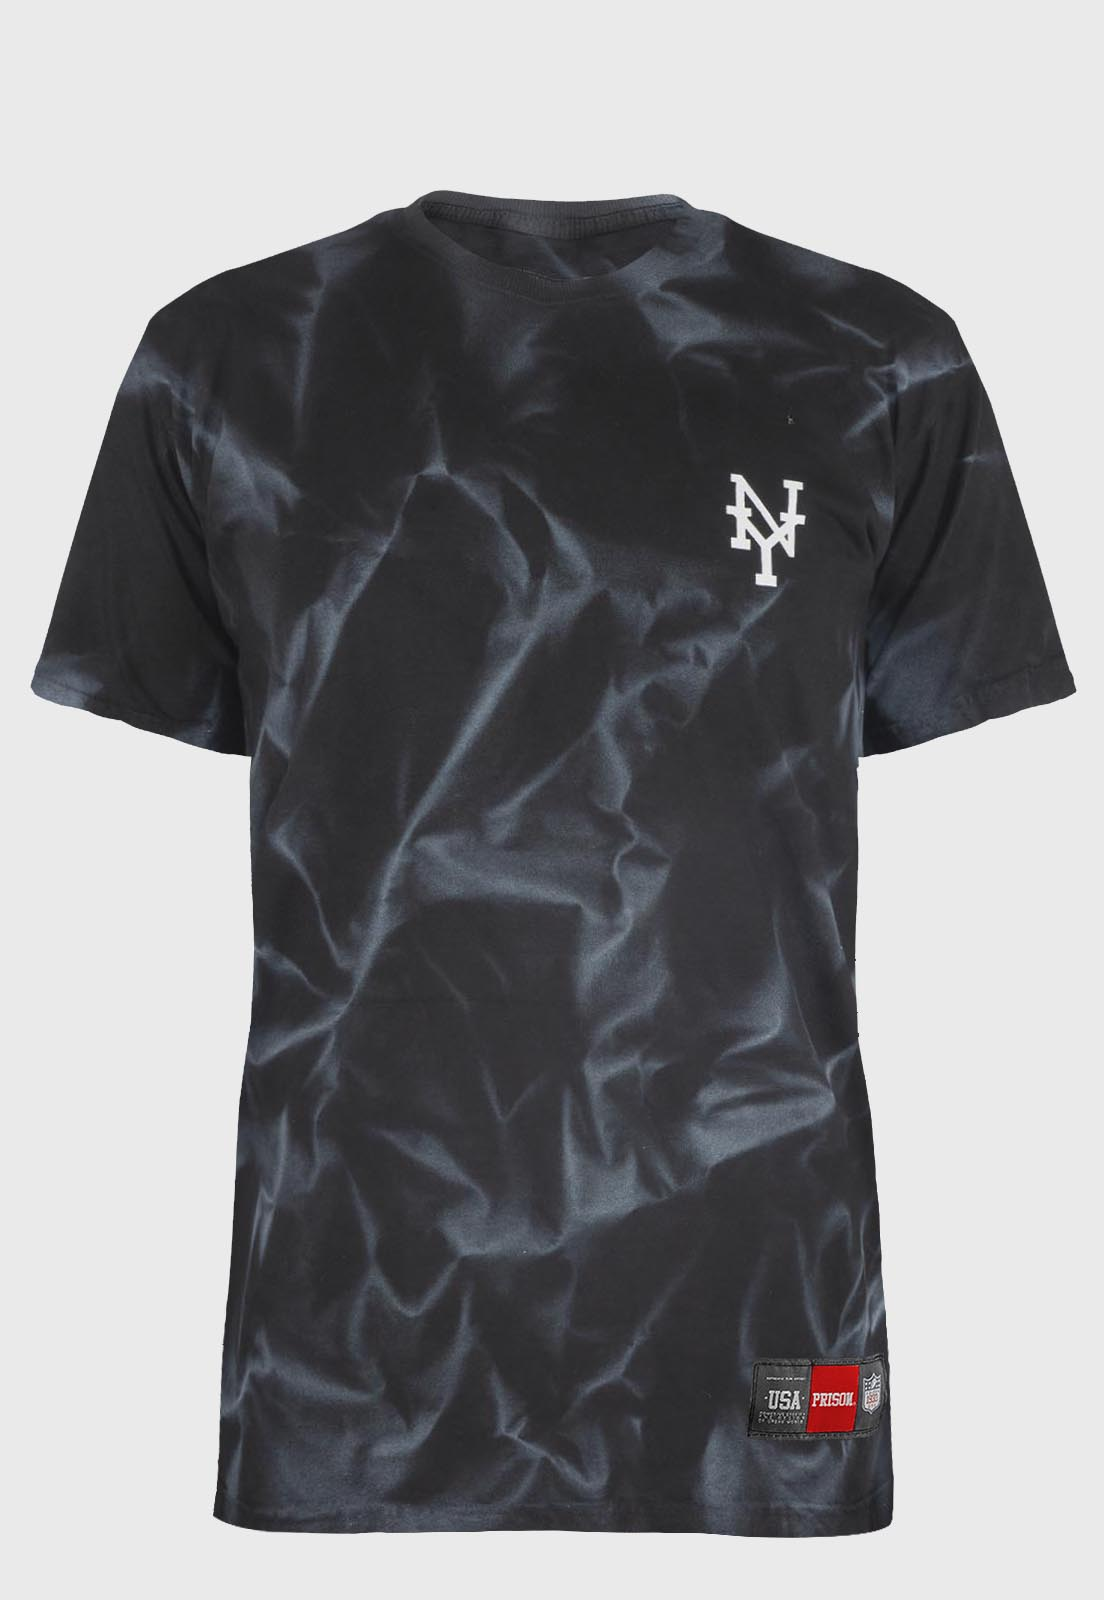 Camiseta streetwear Prison Tie-dye Black